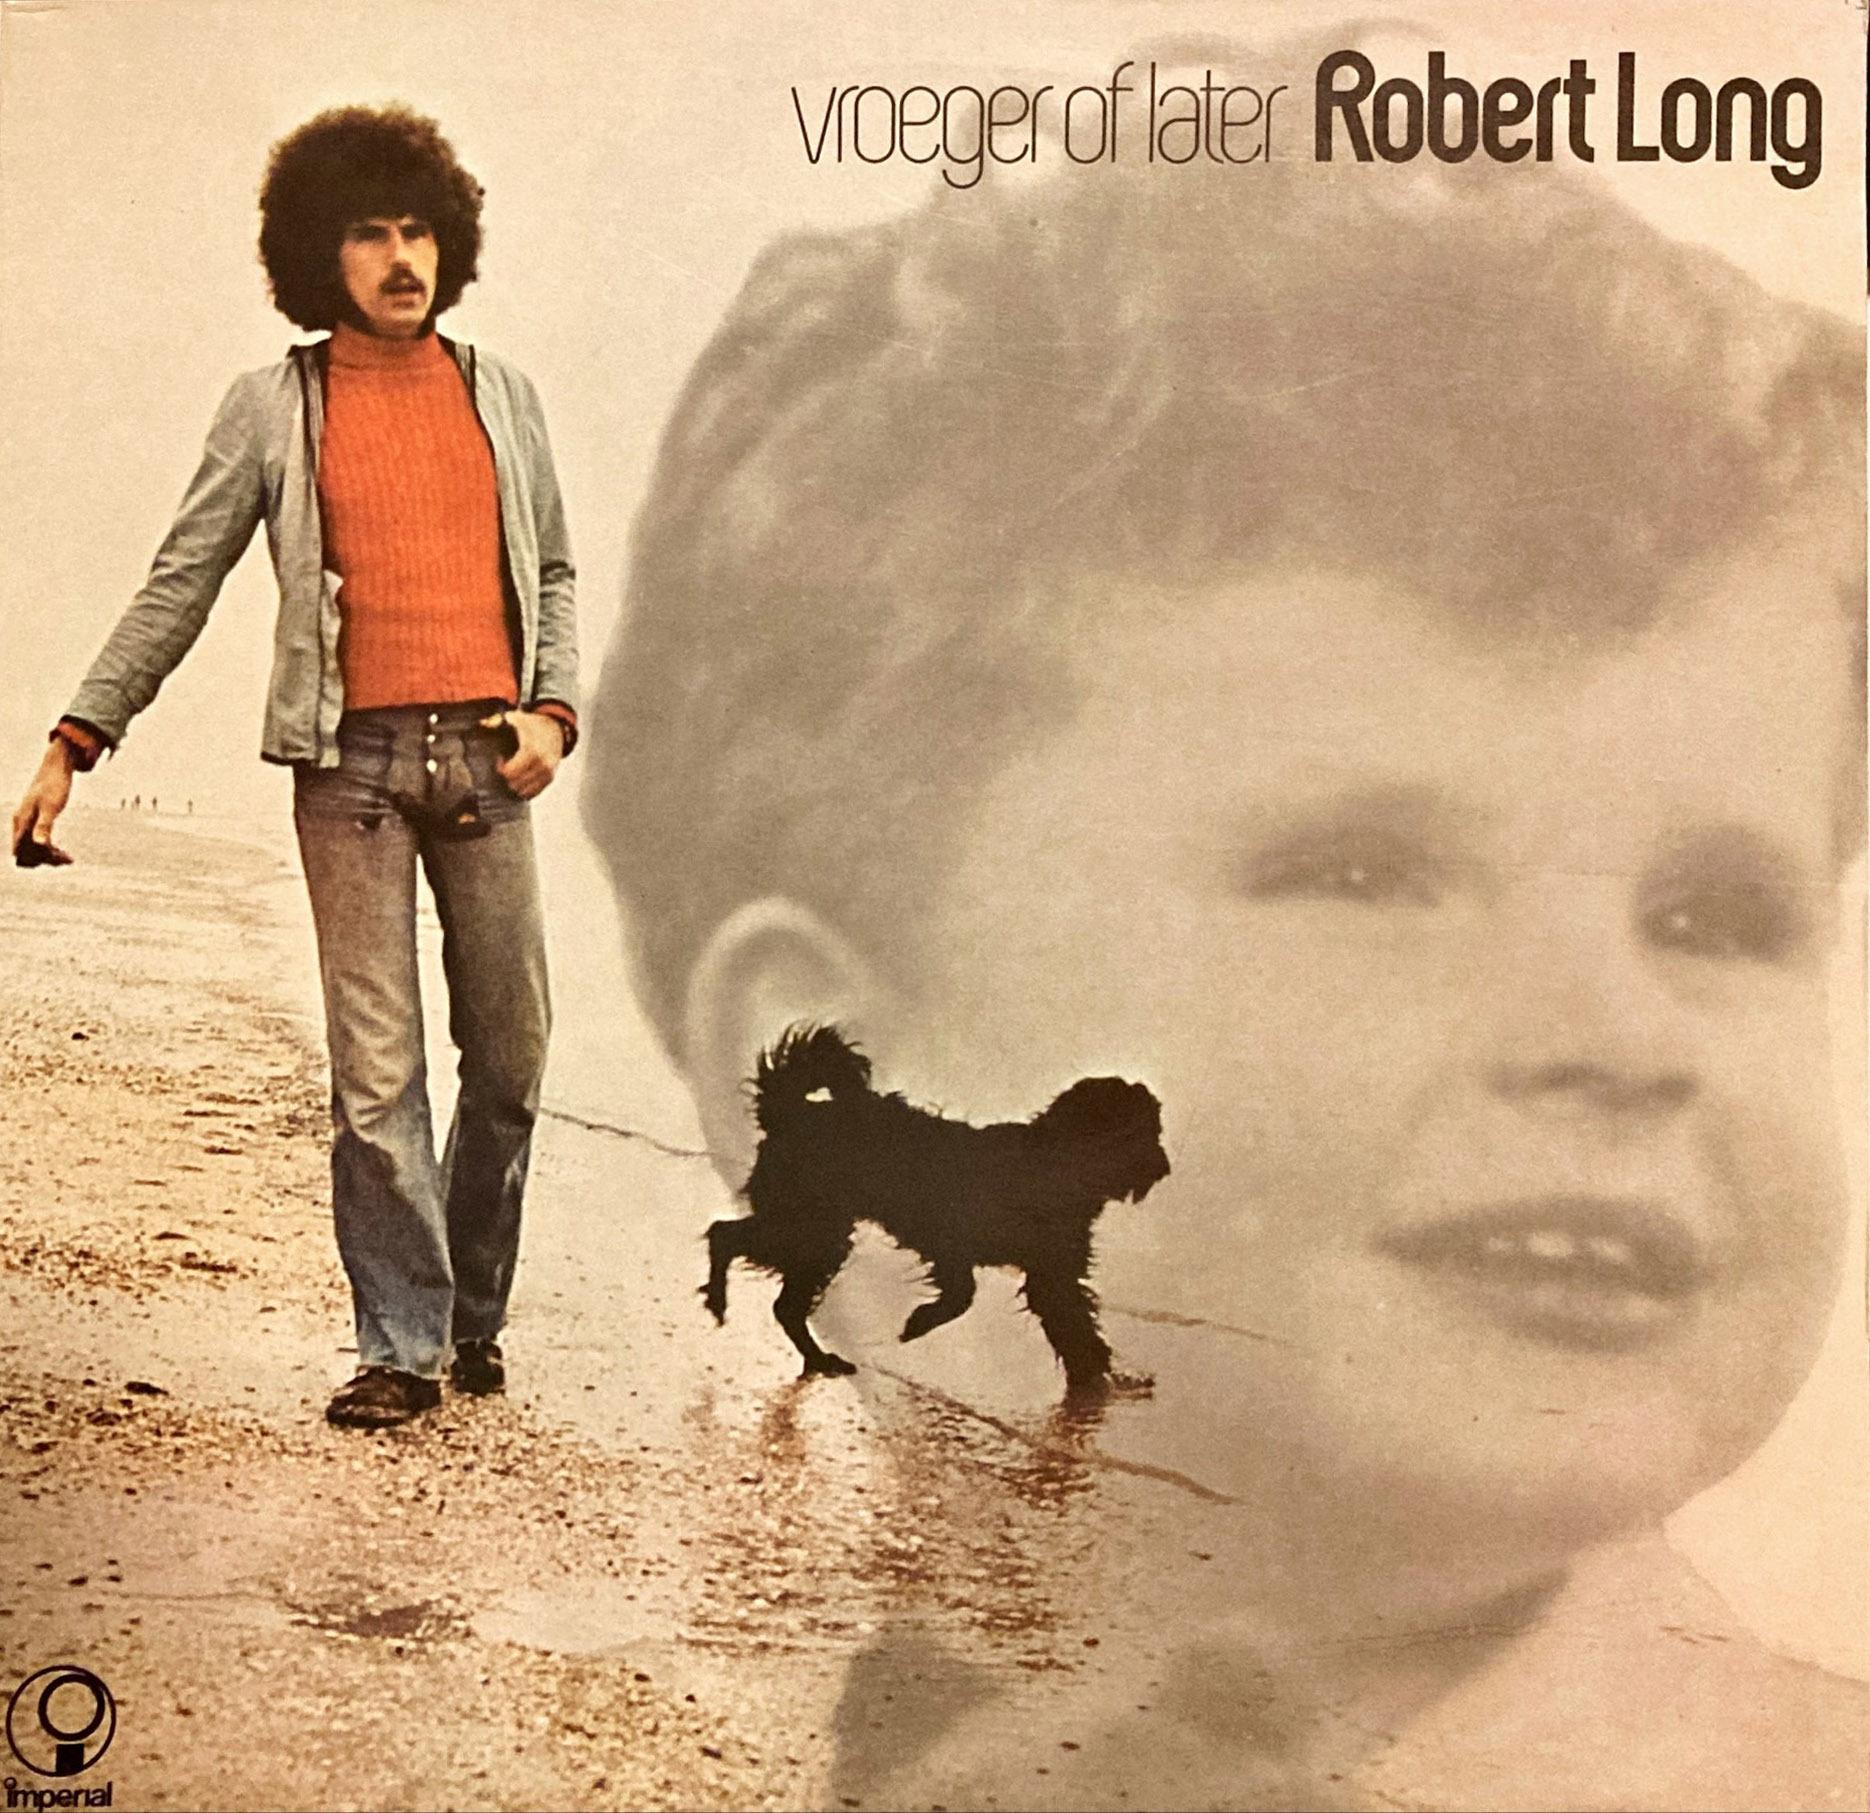 Vroeger Of later - Robert Long